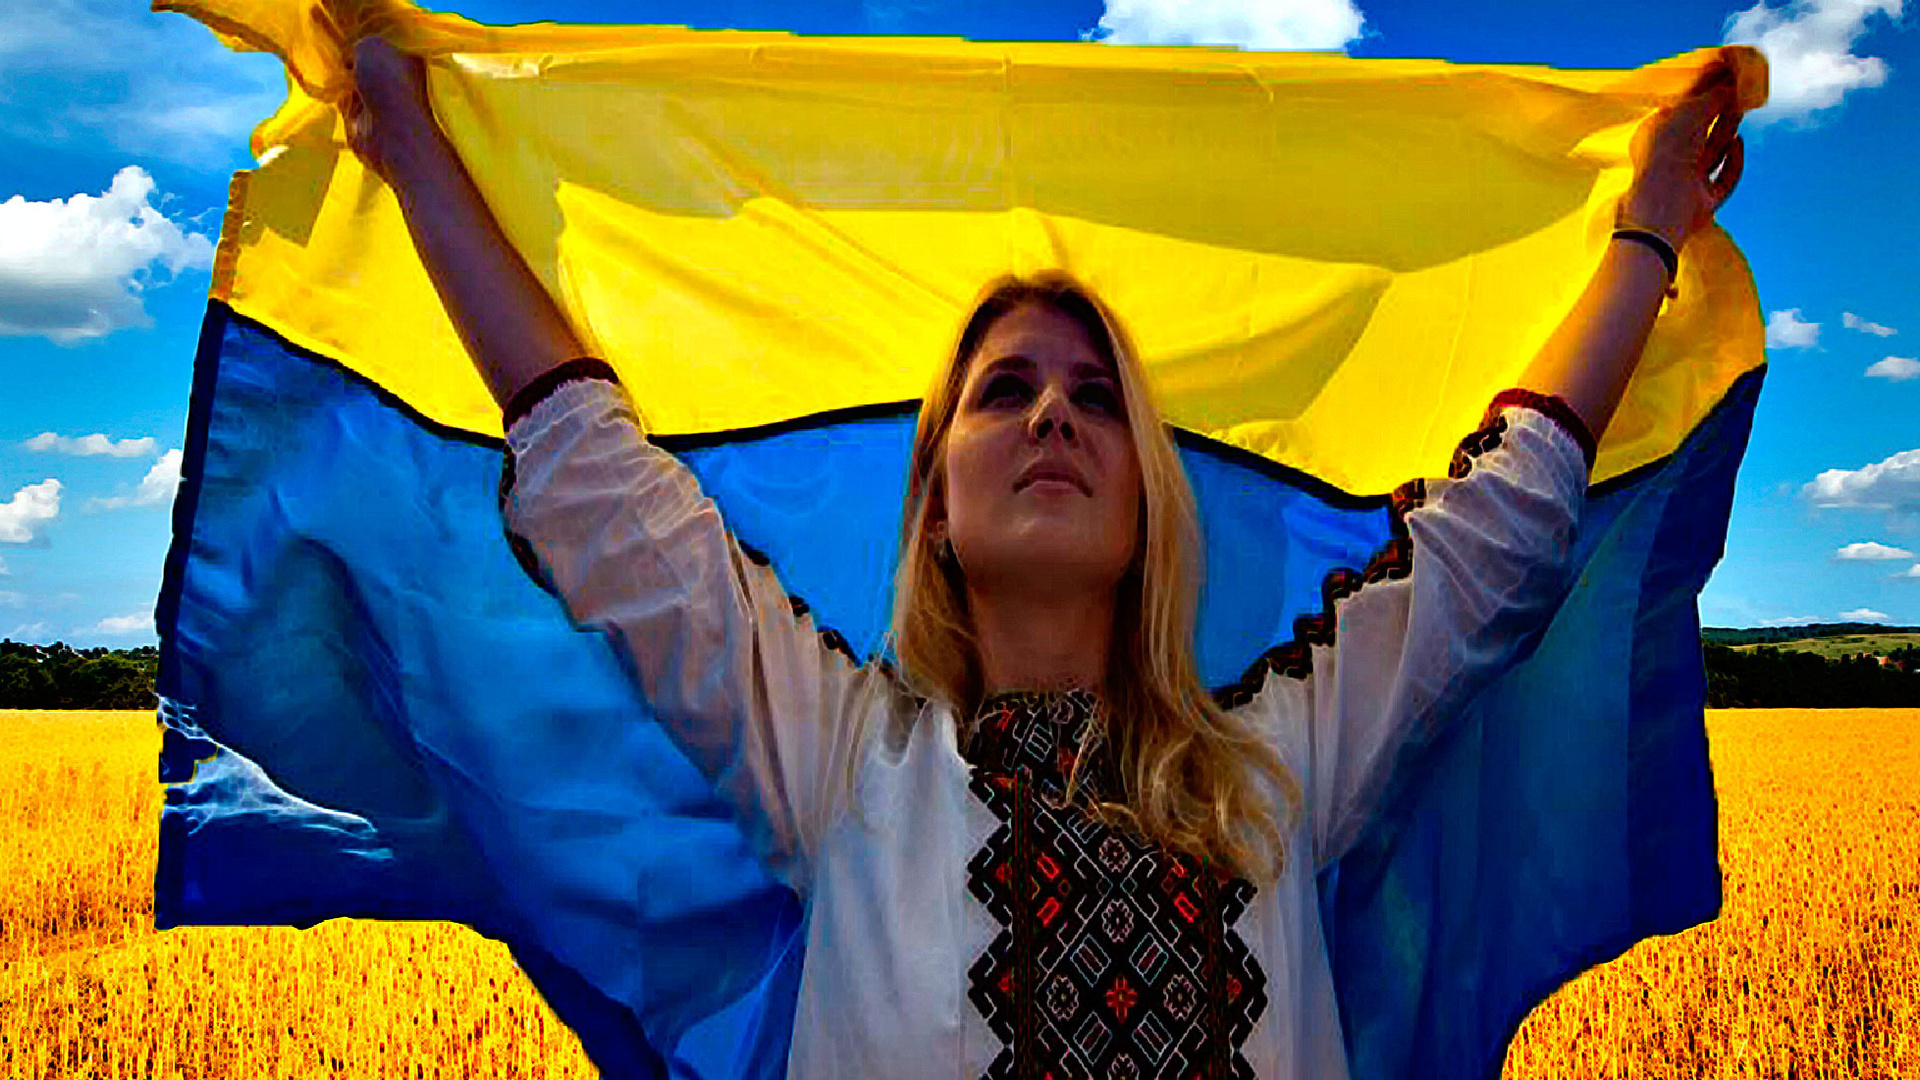 заняться украина картинки люди мужчин